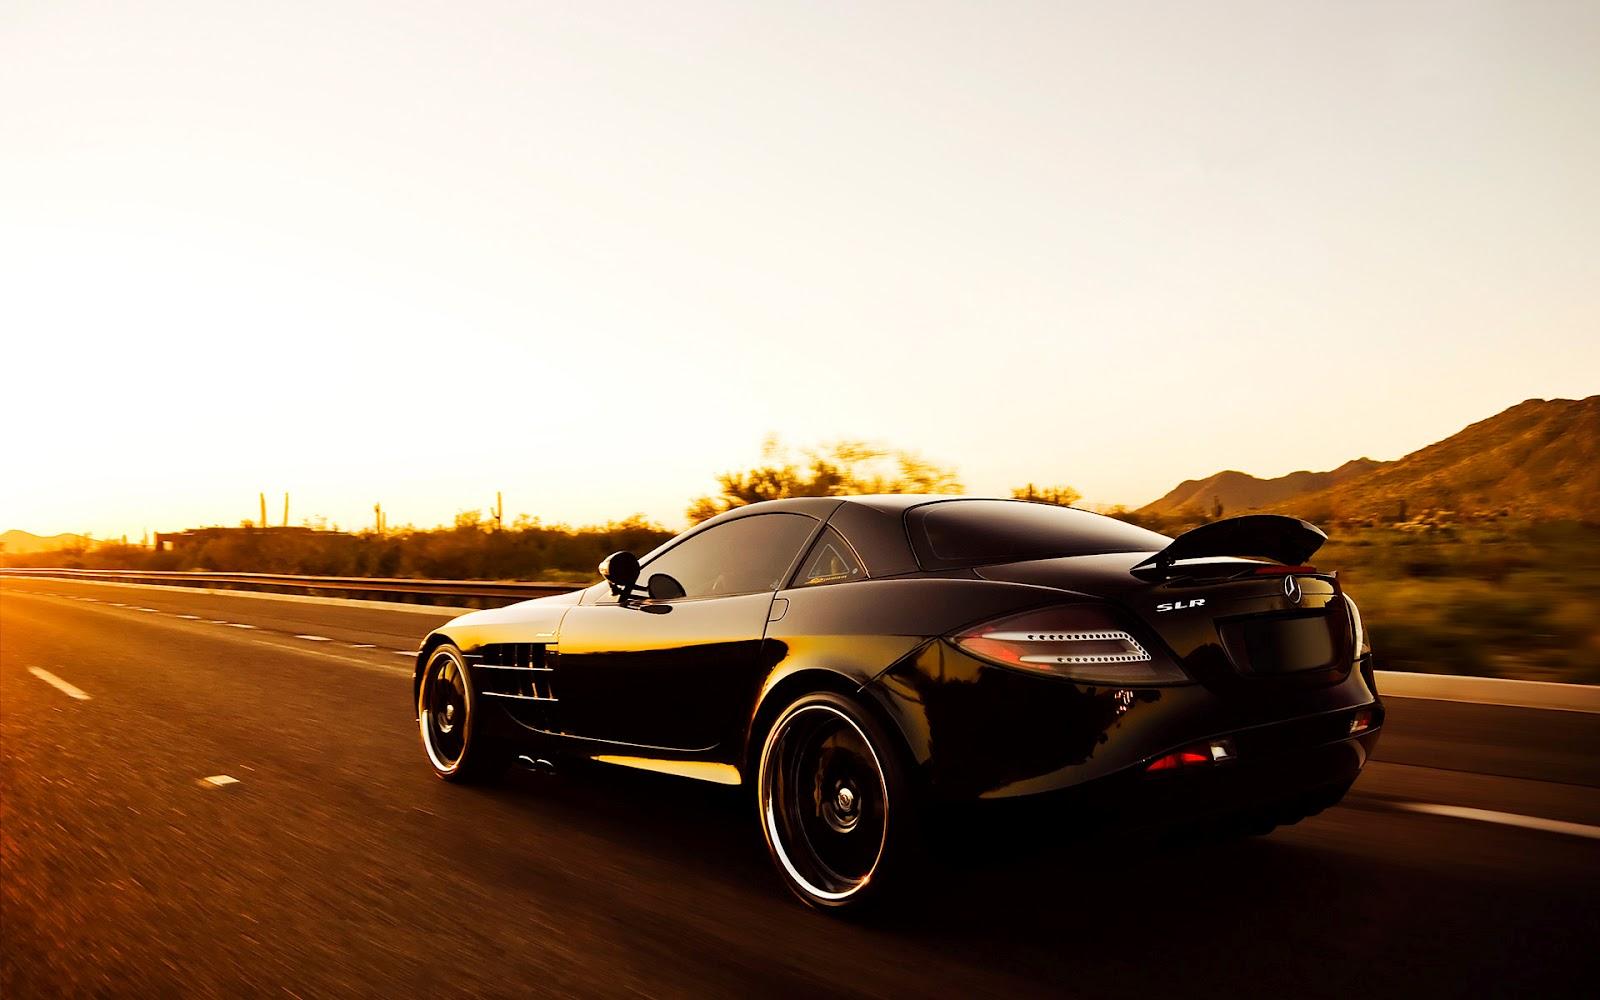 Black mercedes benz slr sunlights hd car wallpapers for Mercedes benz black on black